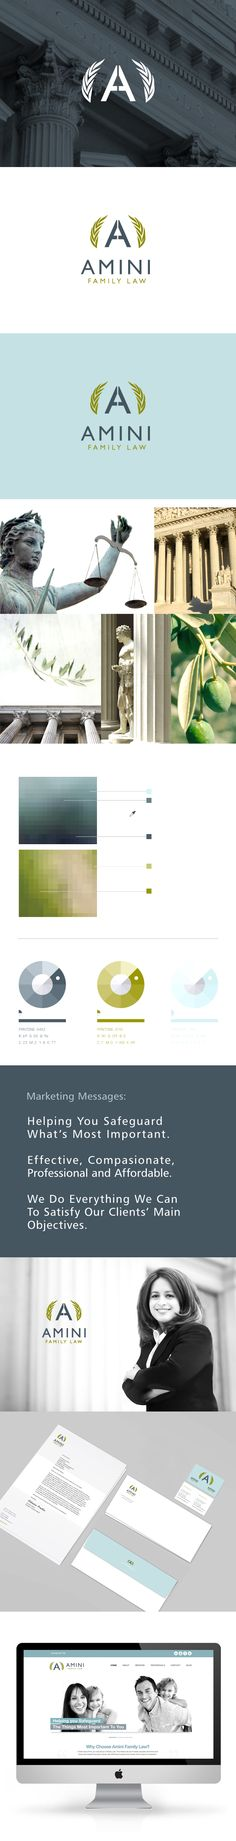 Law Firm Branding - Logo Design - Website - Printing